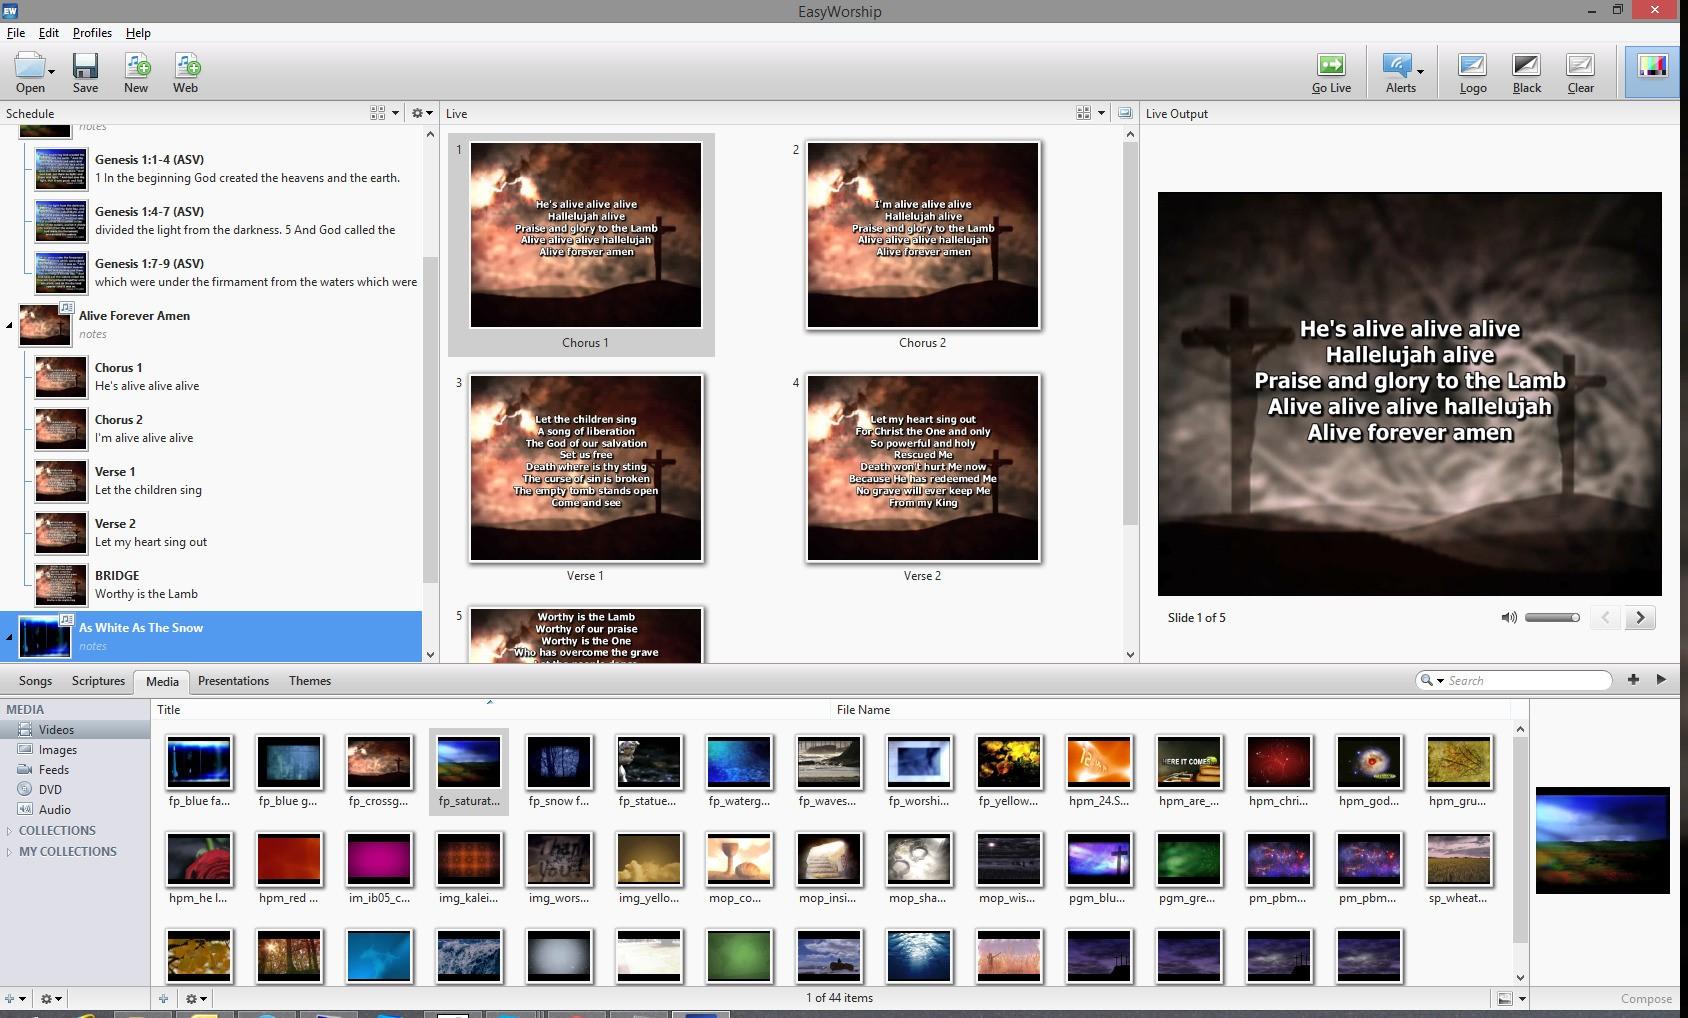 EasyWorship Crack 7.2.3.0 With Serial Keys Full Download 2021